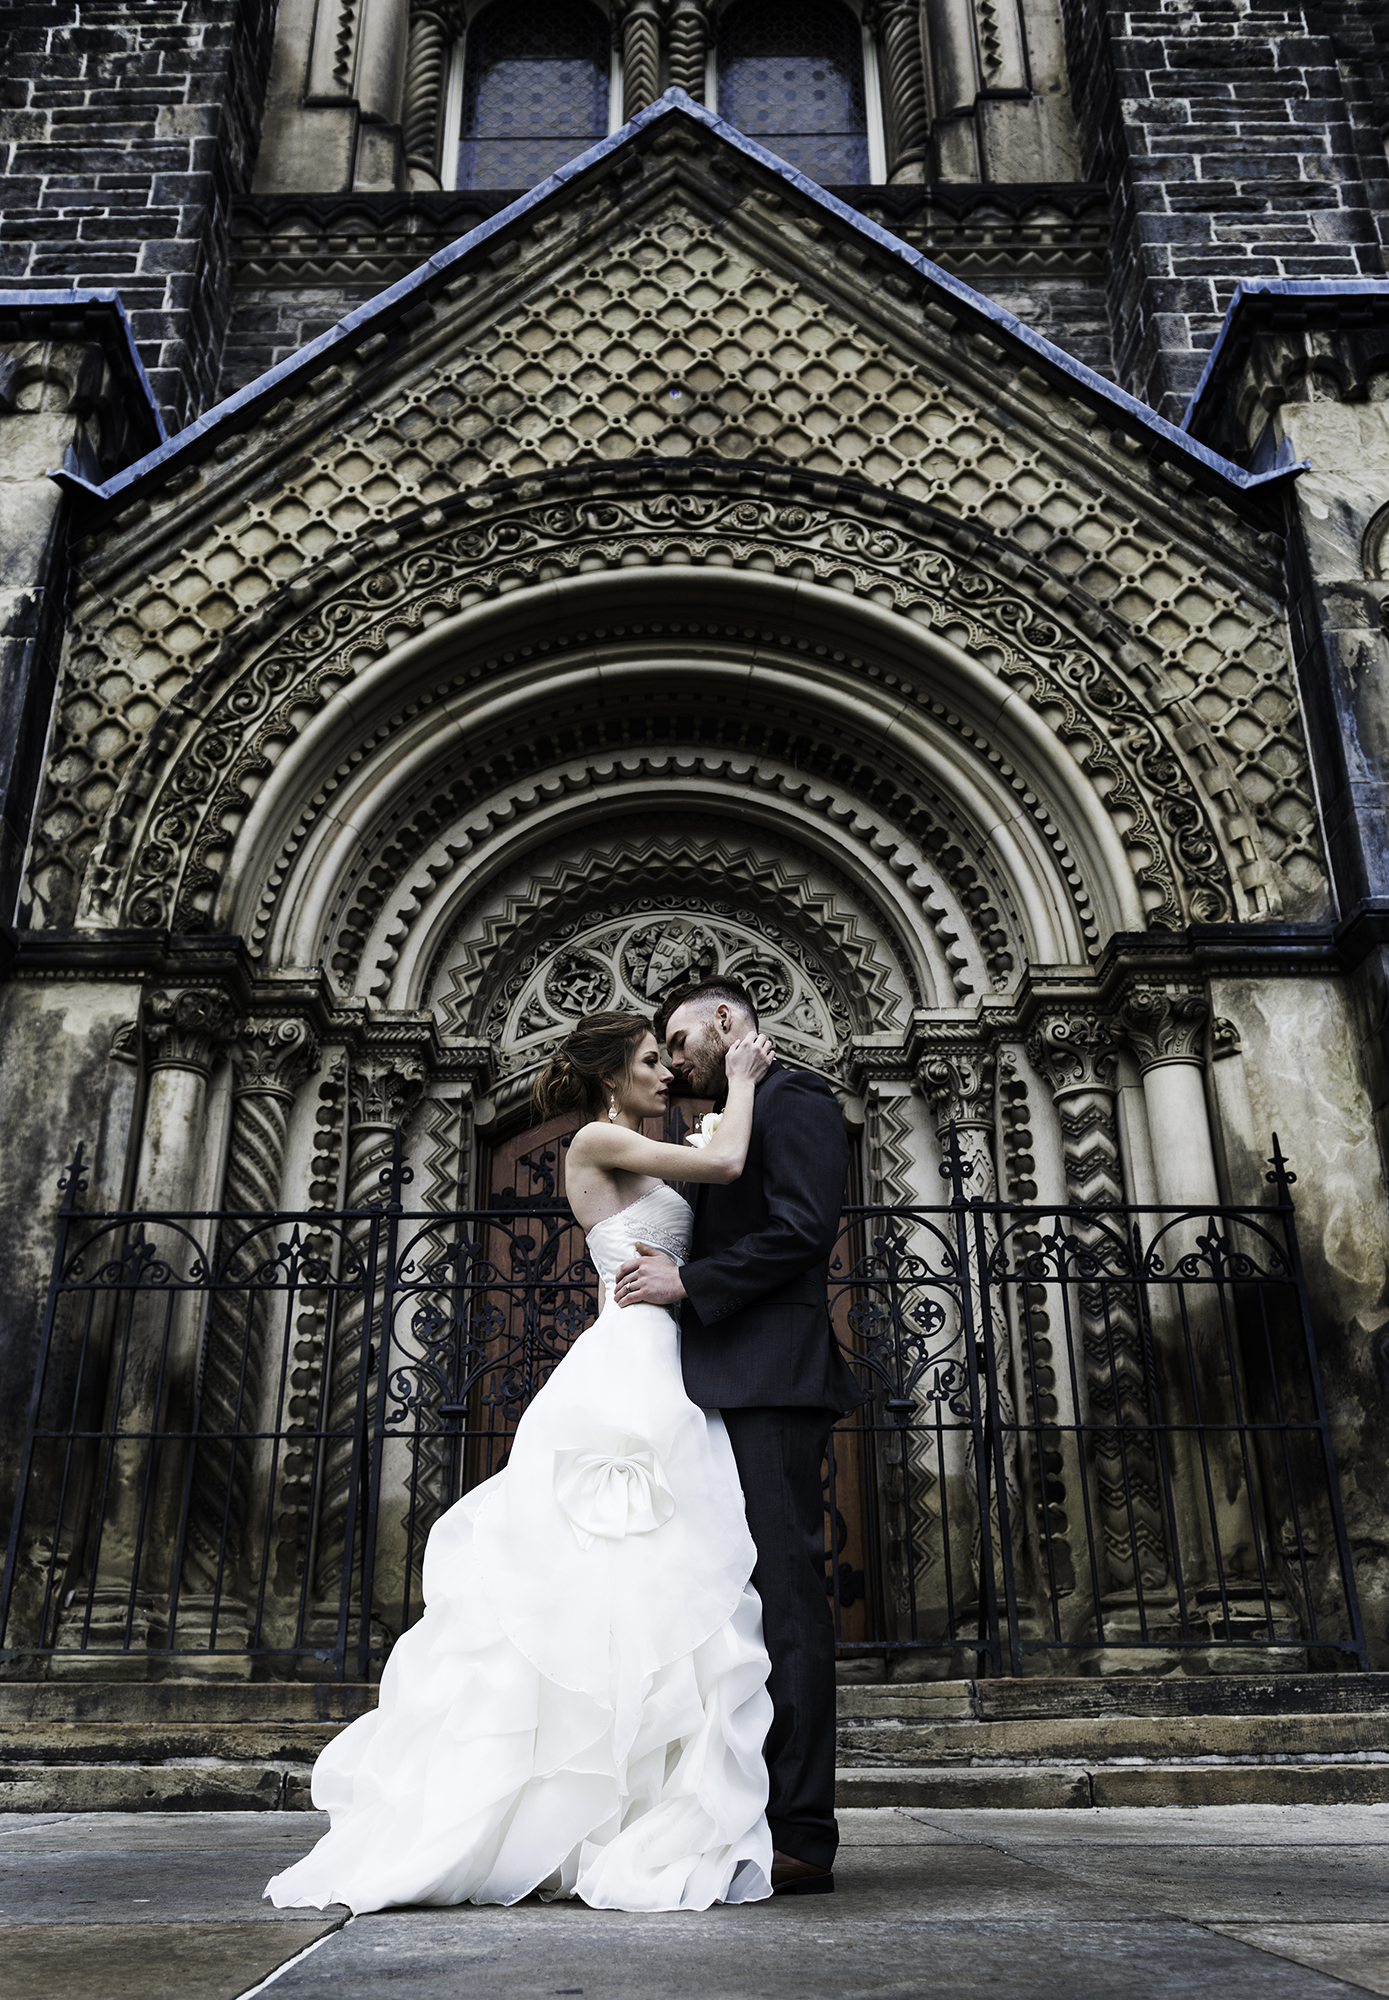 Toronto_Wedding_Photography_Alicia_Campbell_3.jpg